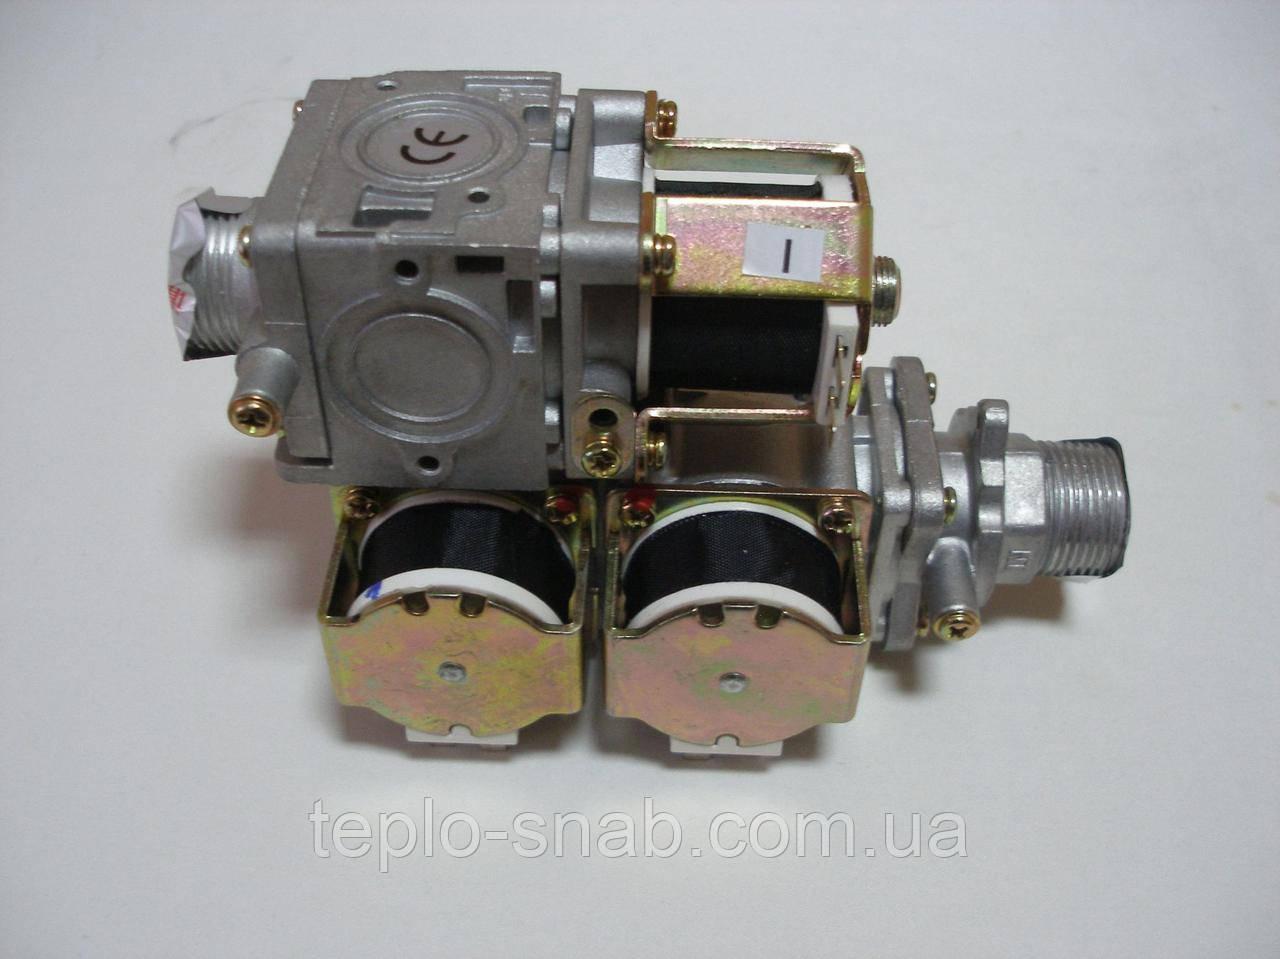 Газовый клапан SOLLY Standart со штуцером и модулятором H4300300016